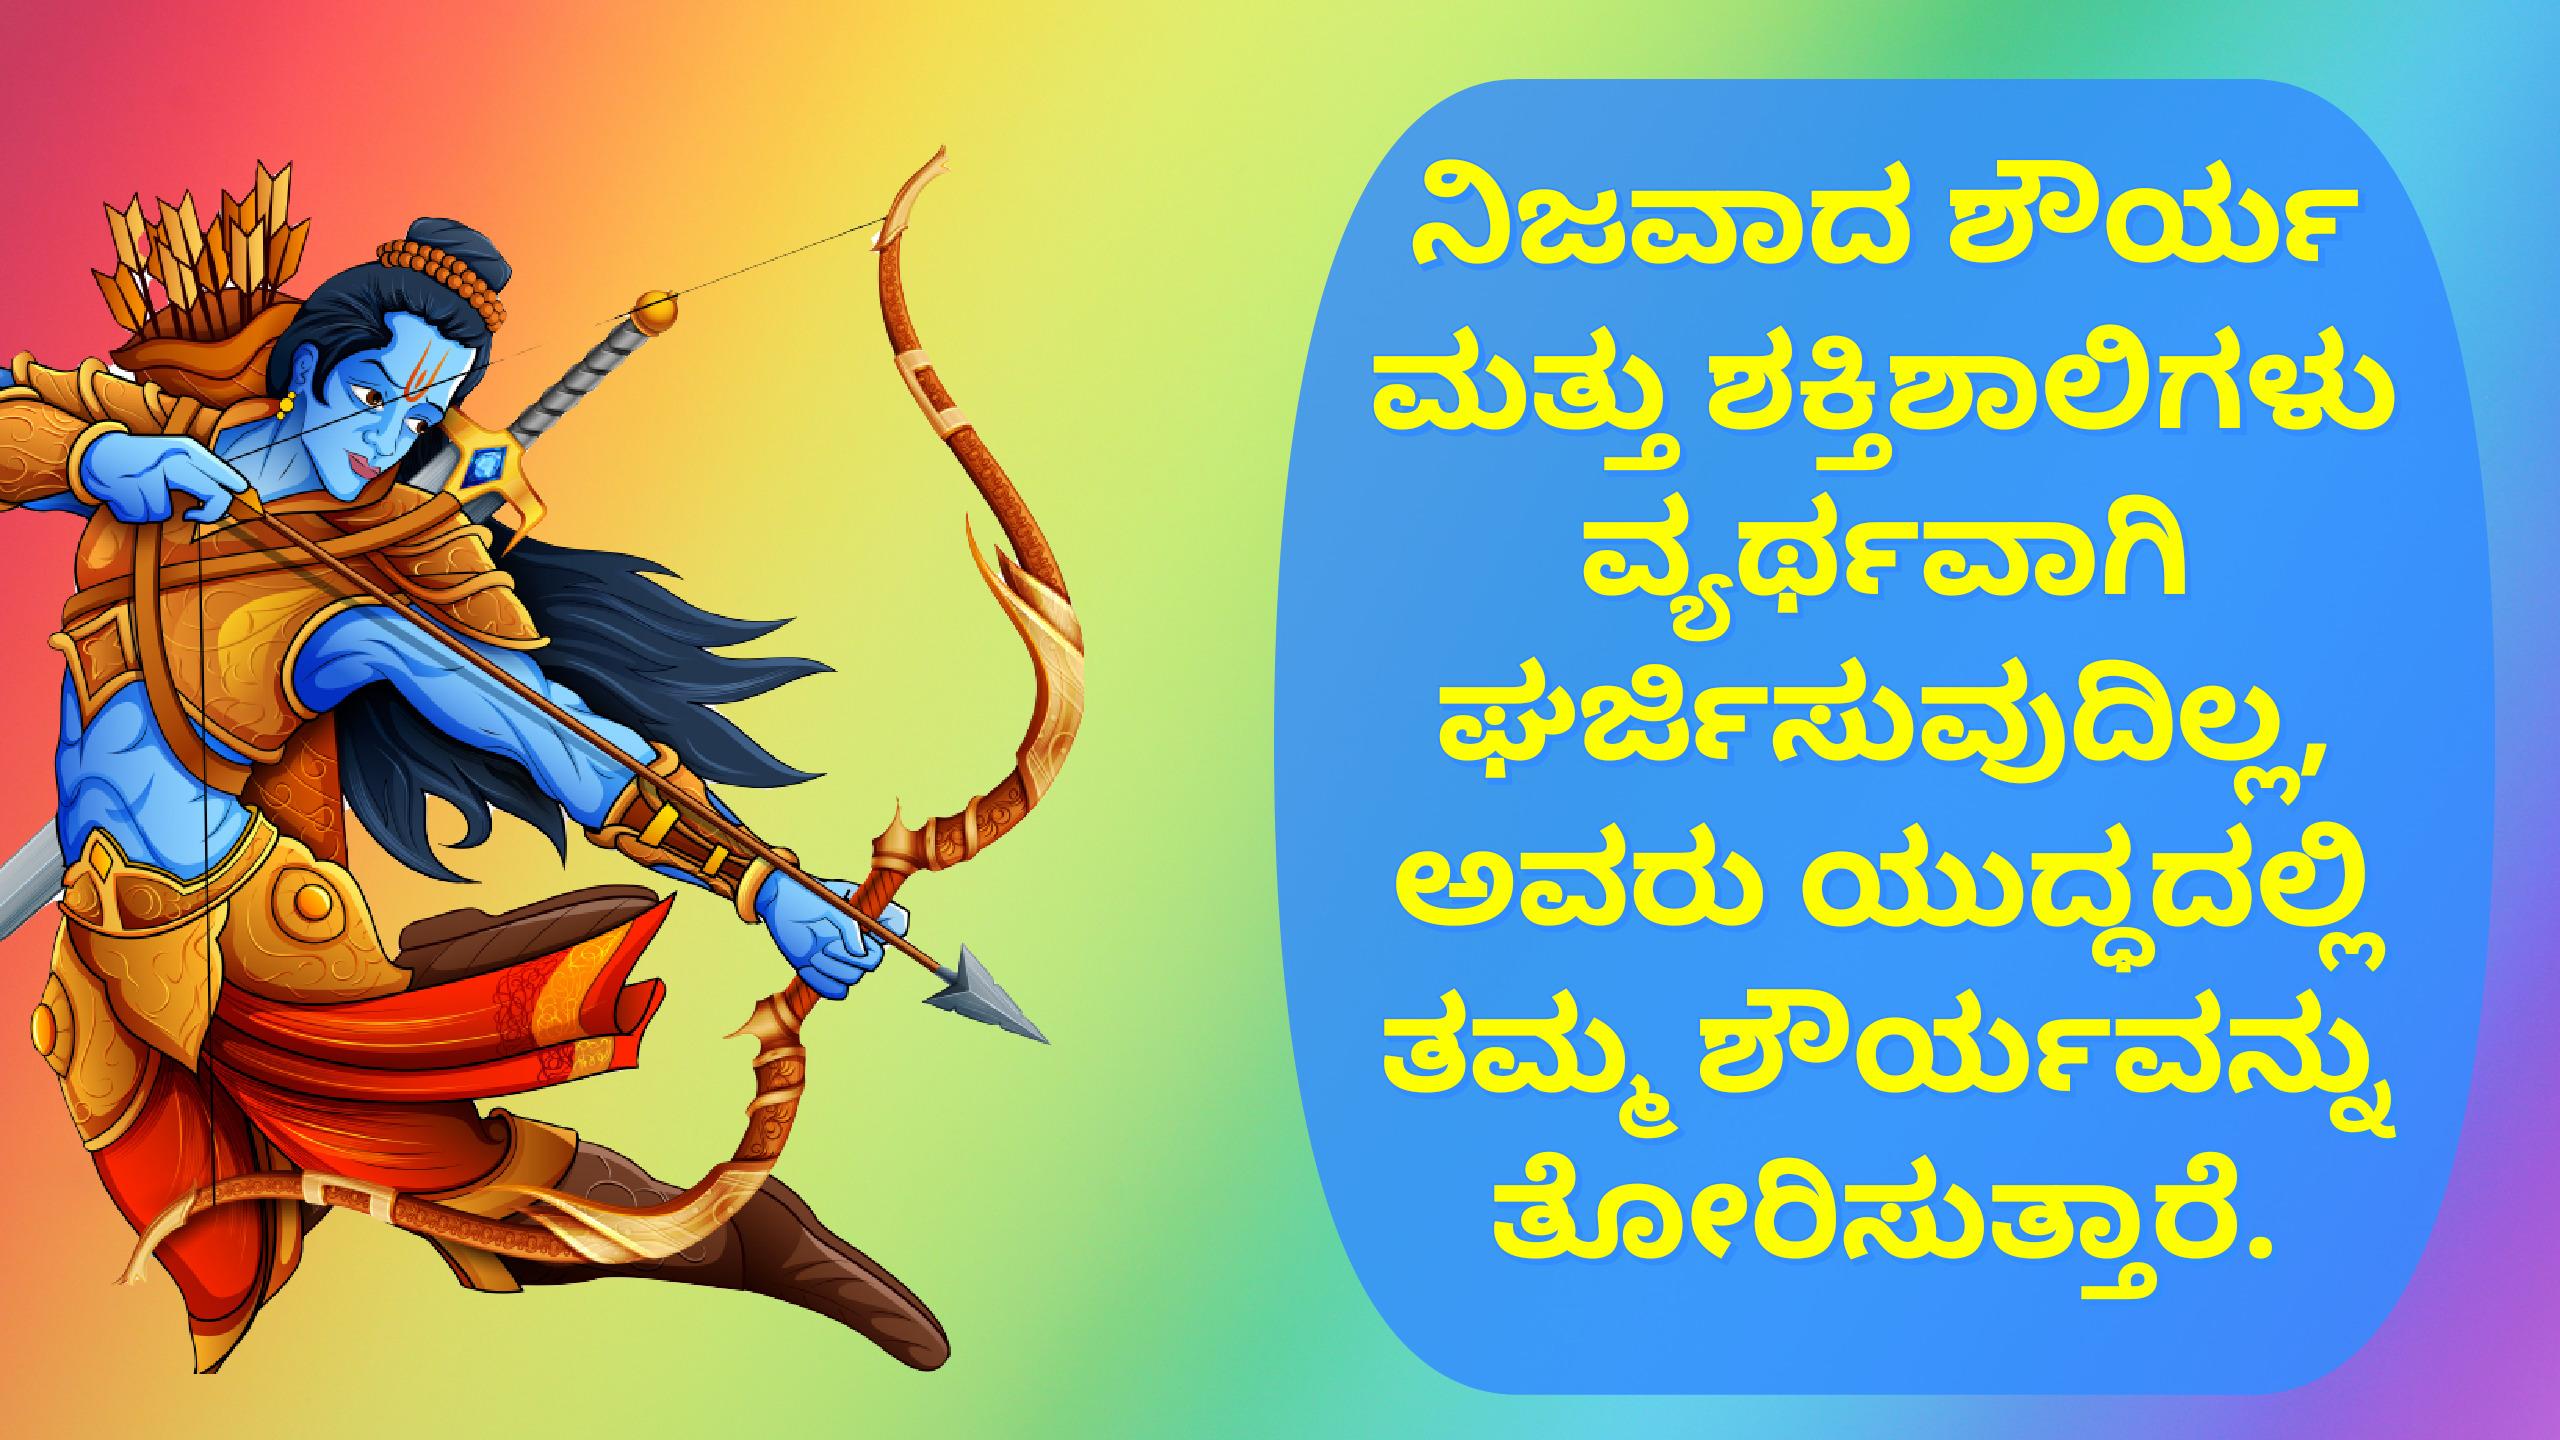 13. Shree Ram Quotes in Kannada